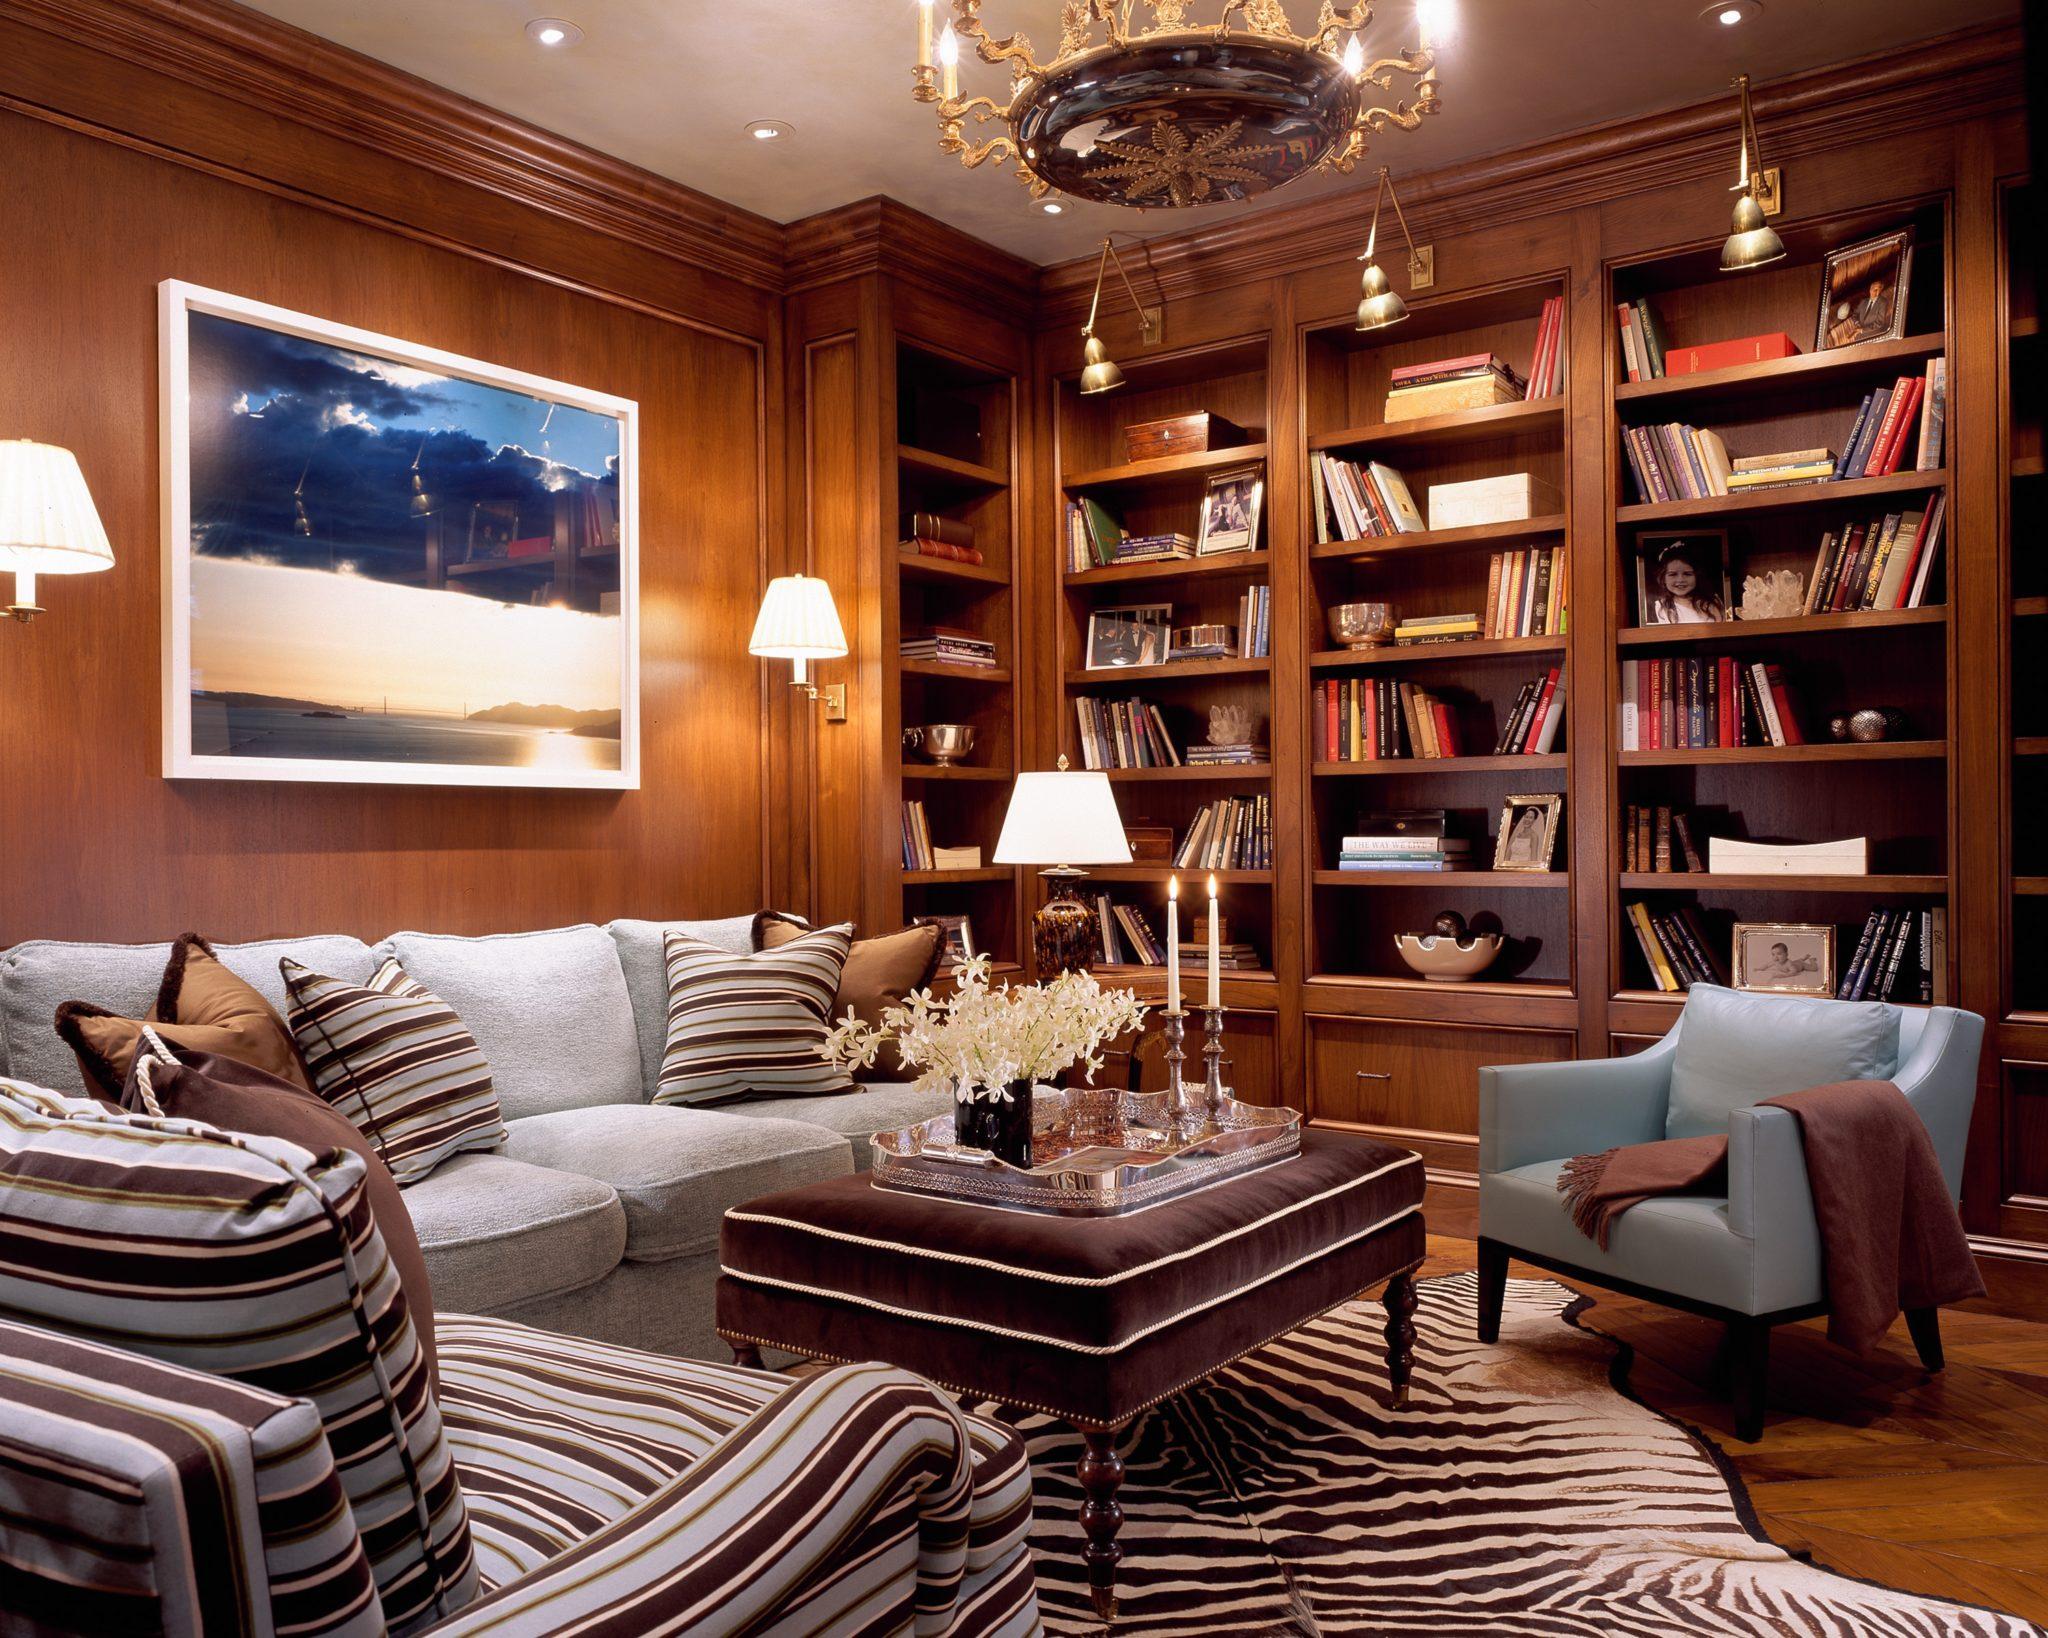 Interior design by Kendall Wilkinson